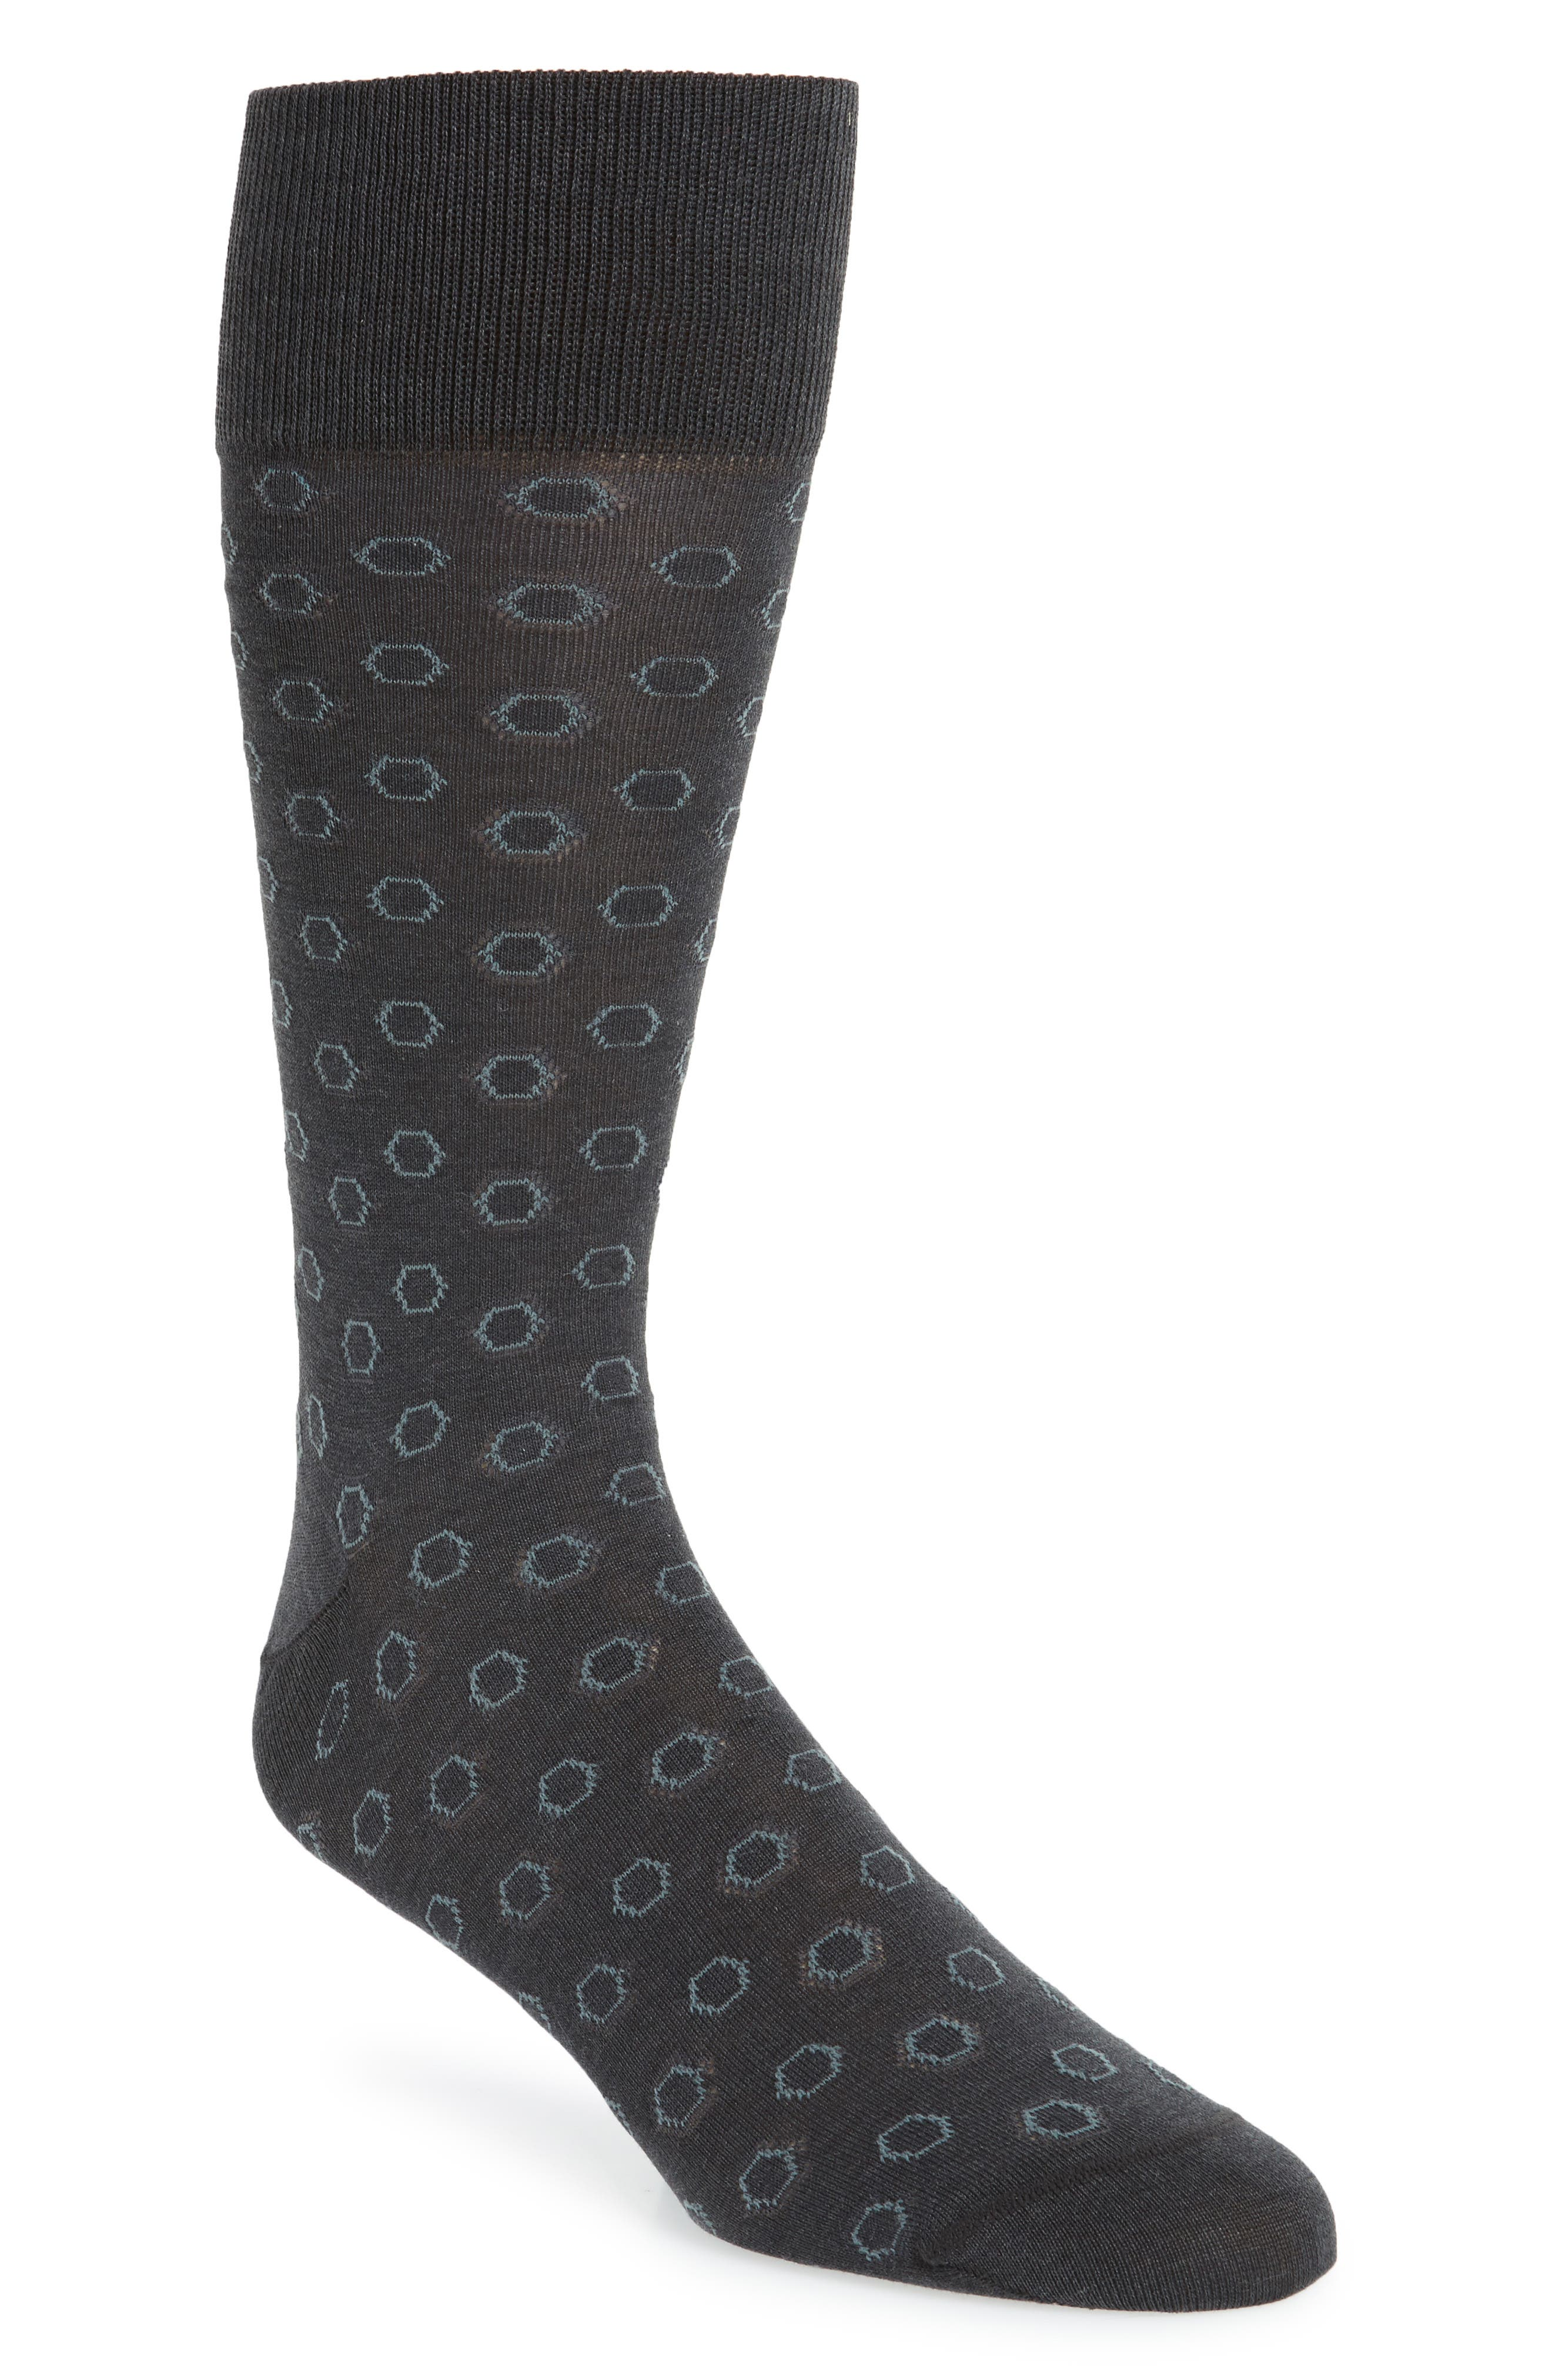 Hexagon Socks,                         Main,                         color, Charcoal Heather